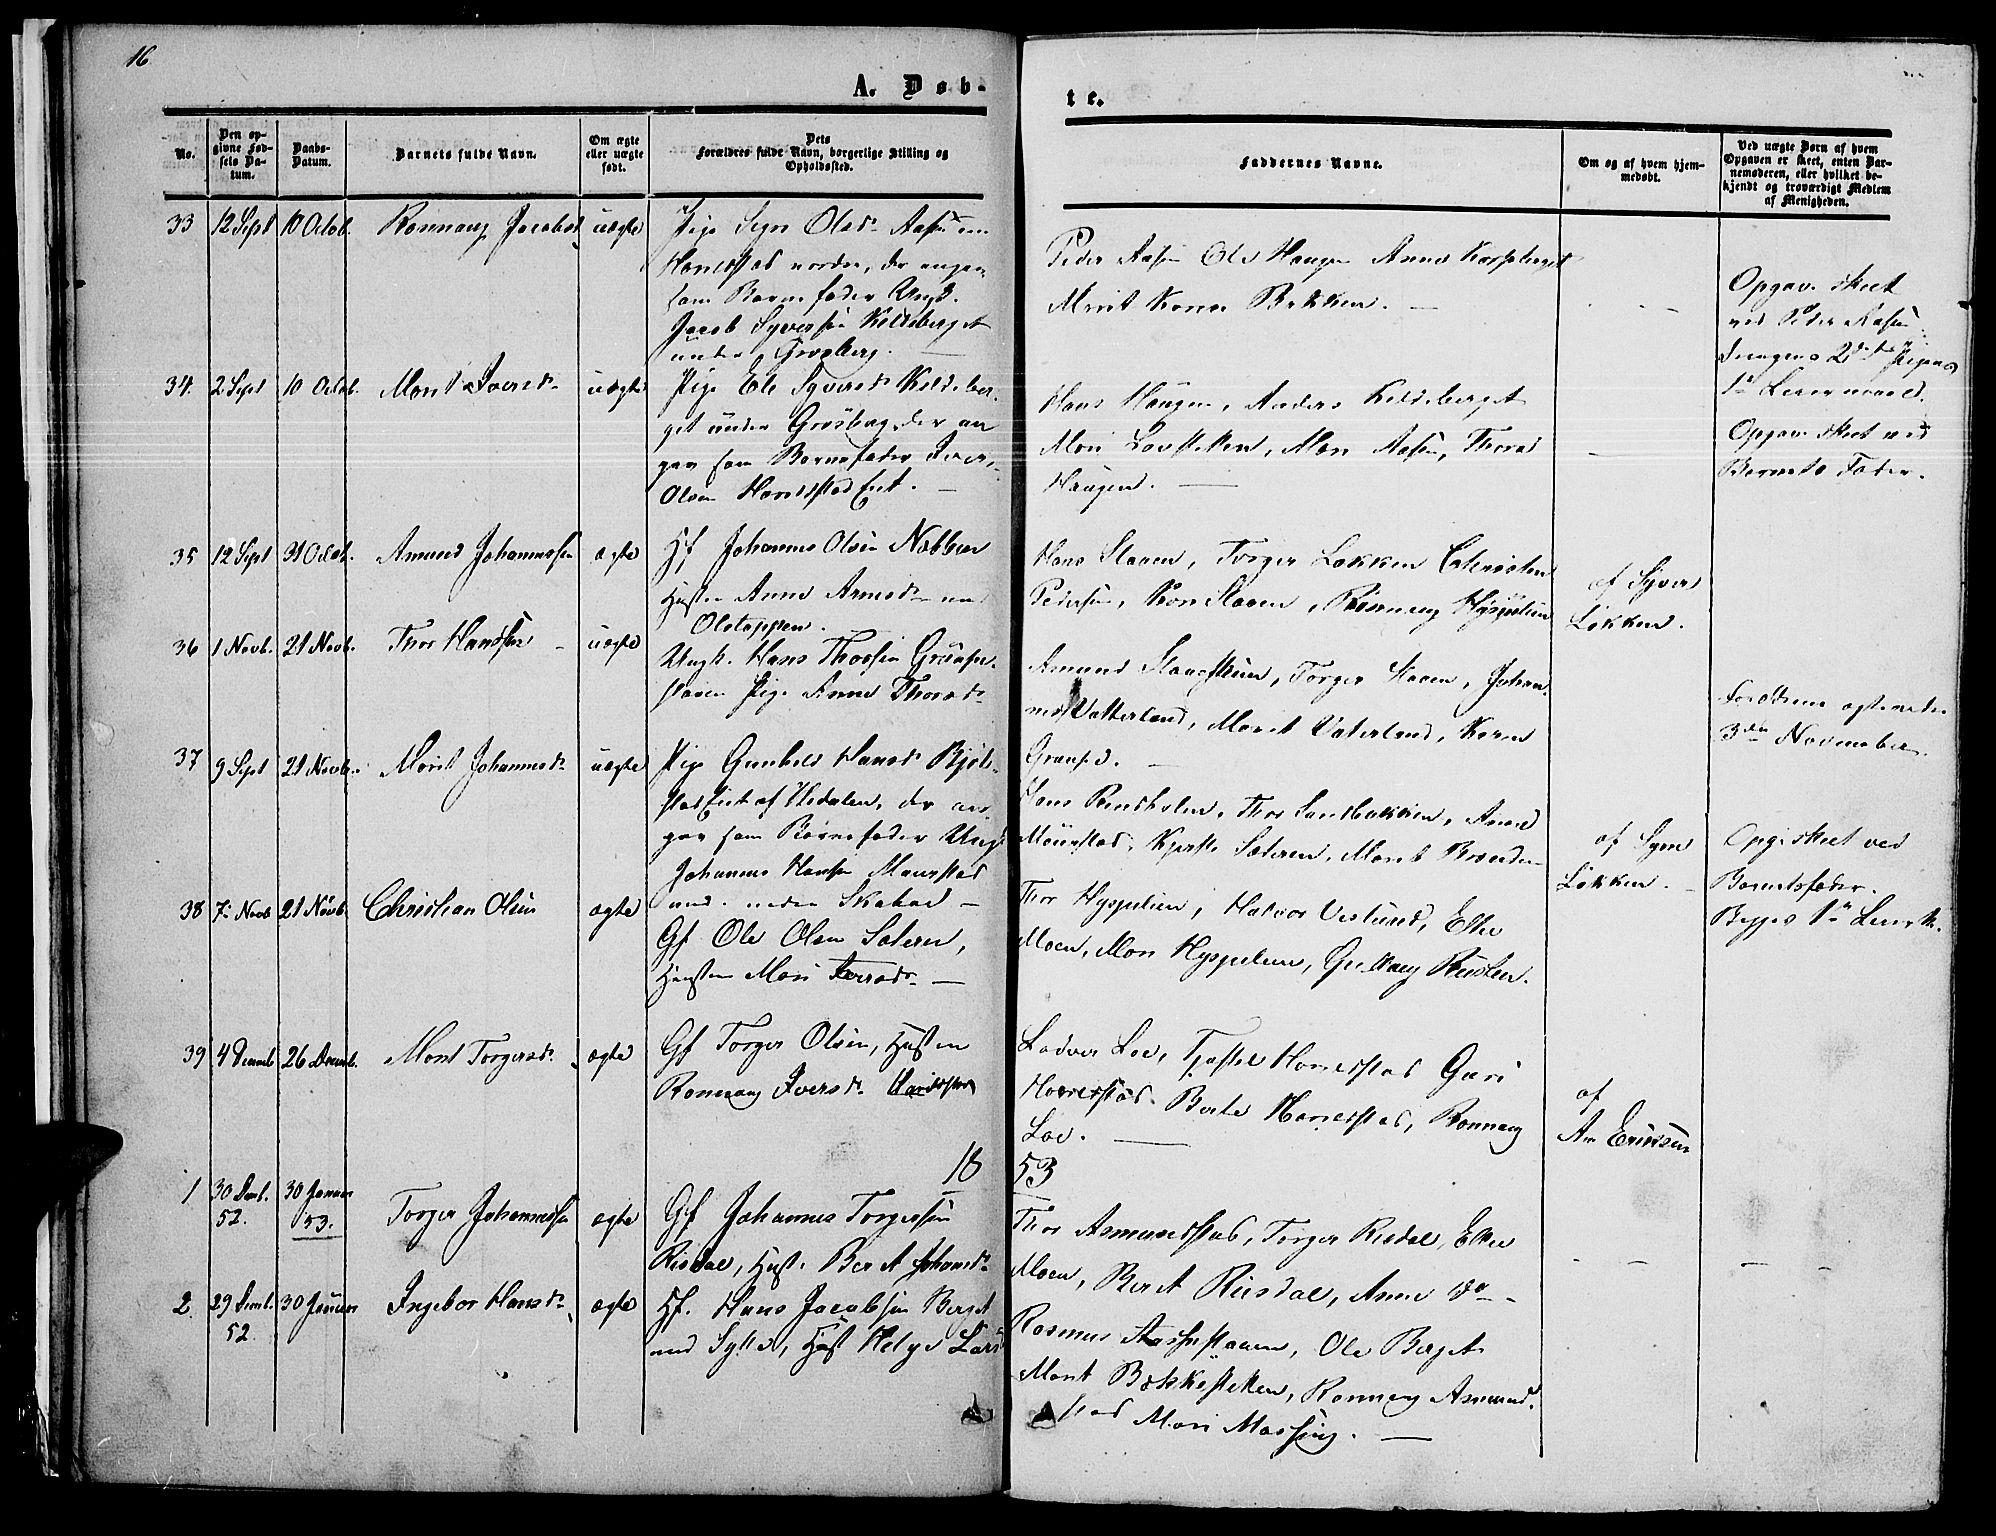 SAH, Nord-Fron prestekontor, Klokkerbok nr. 2, 1851-1883, s. 16